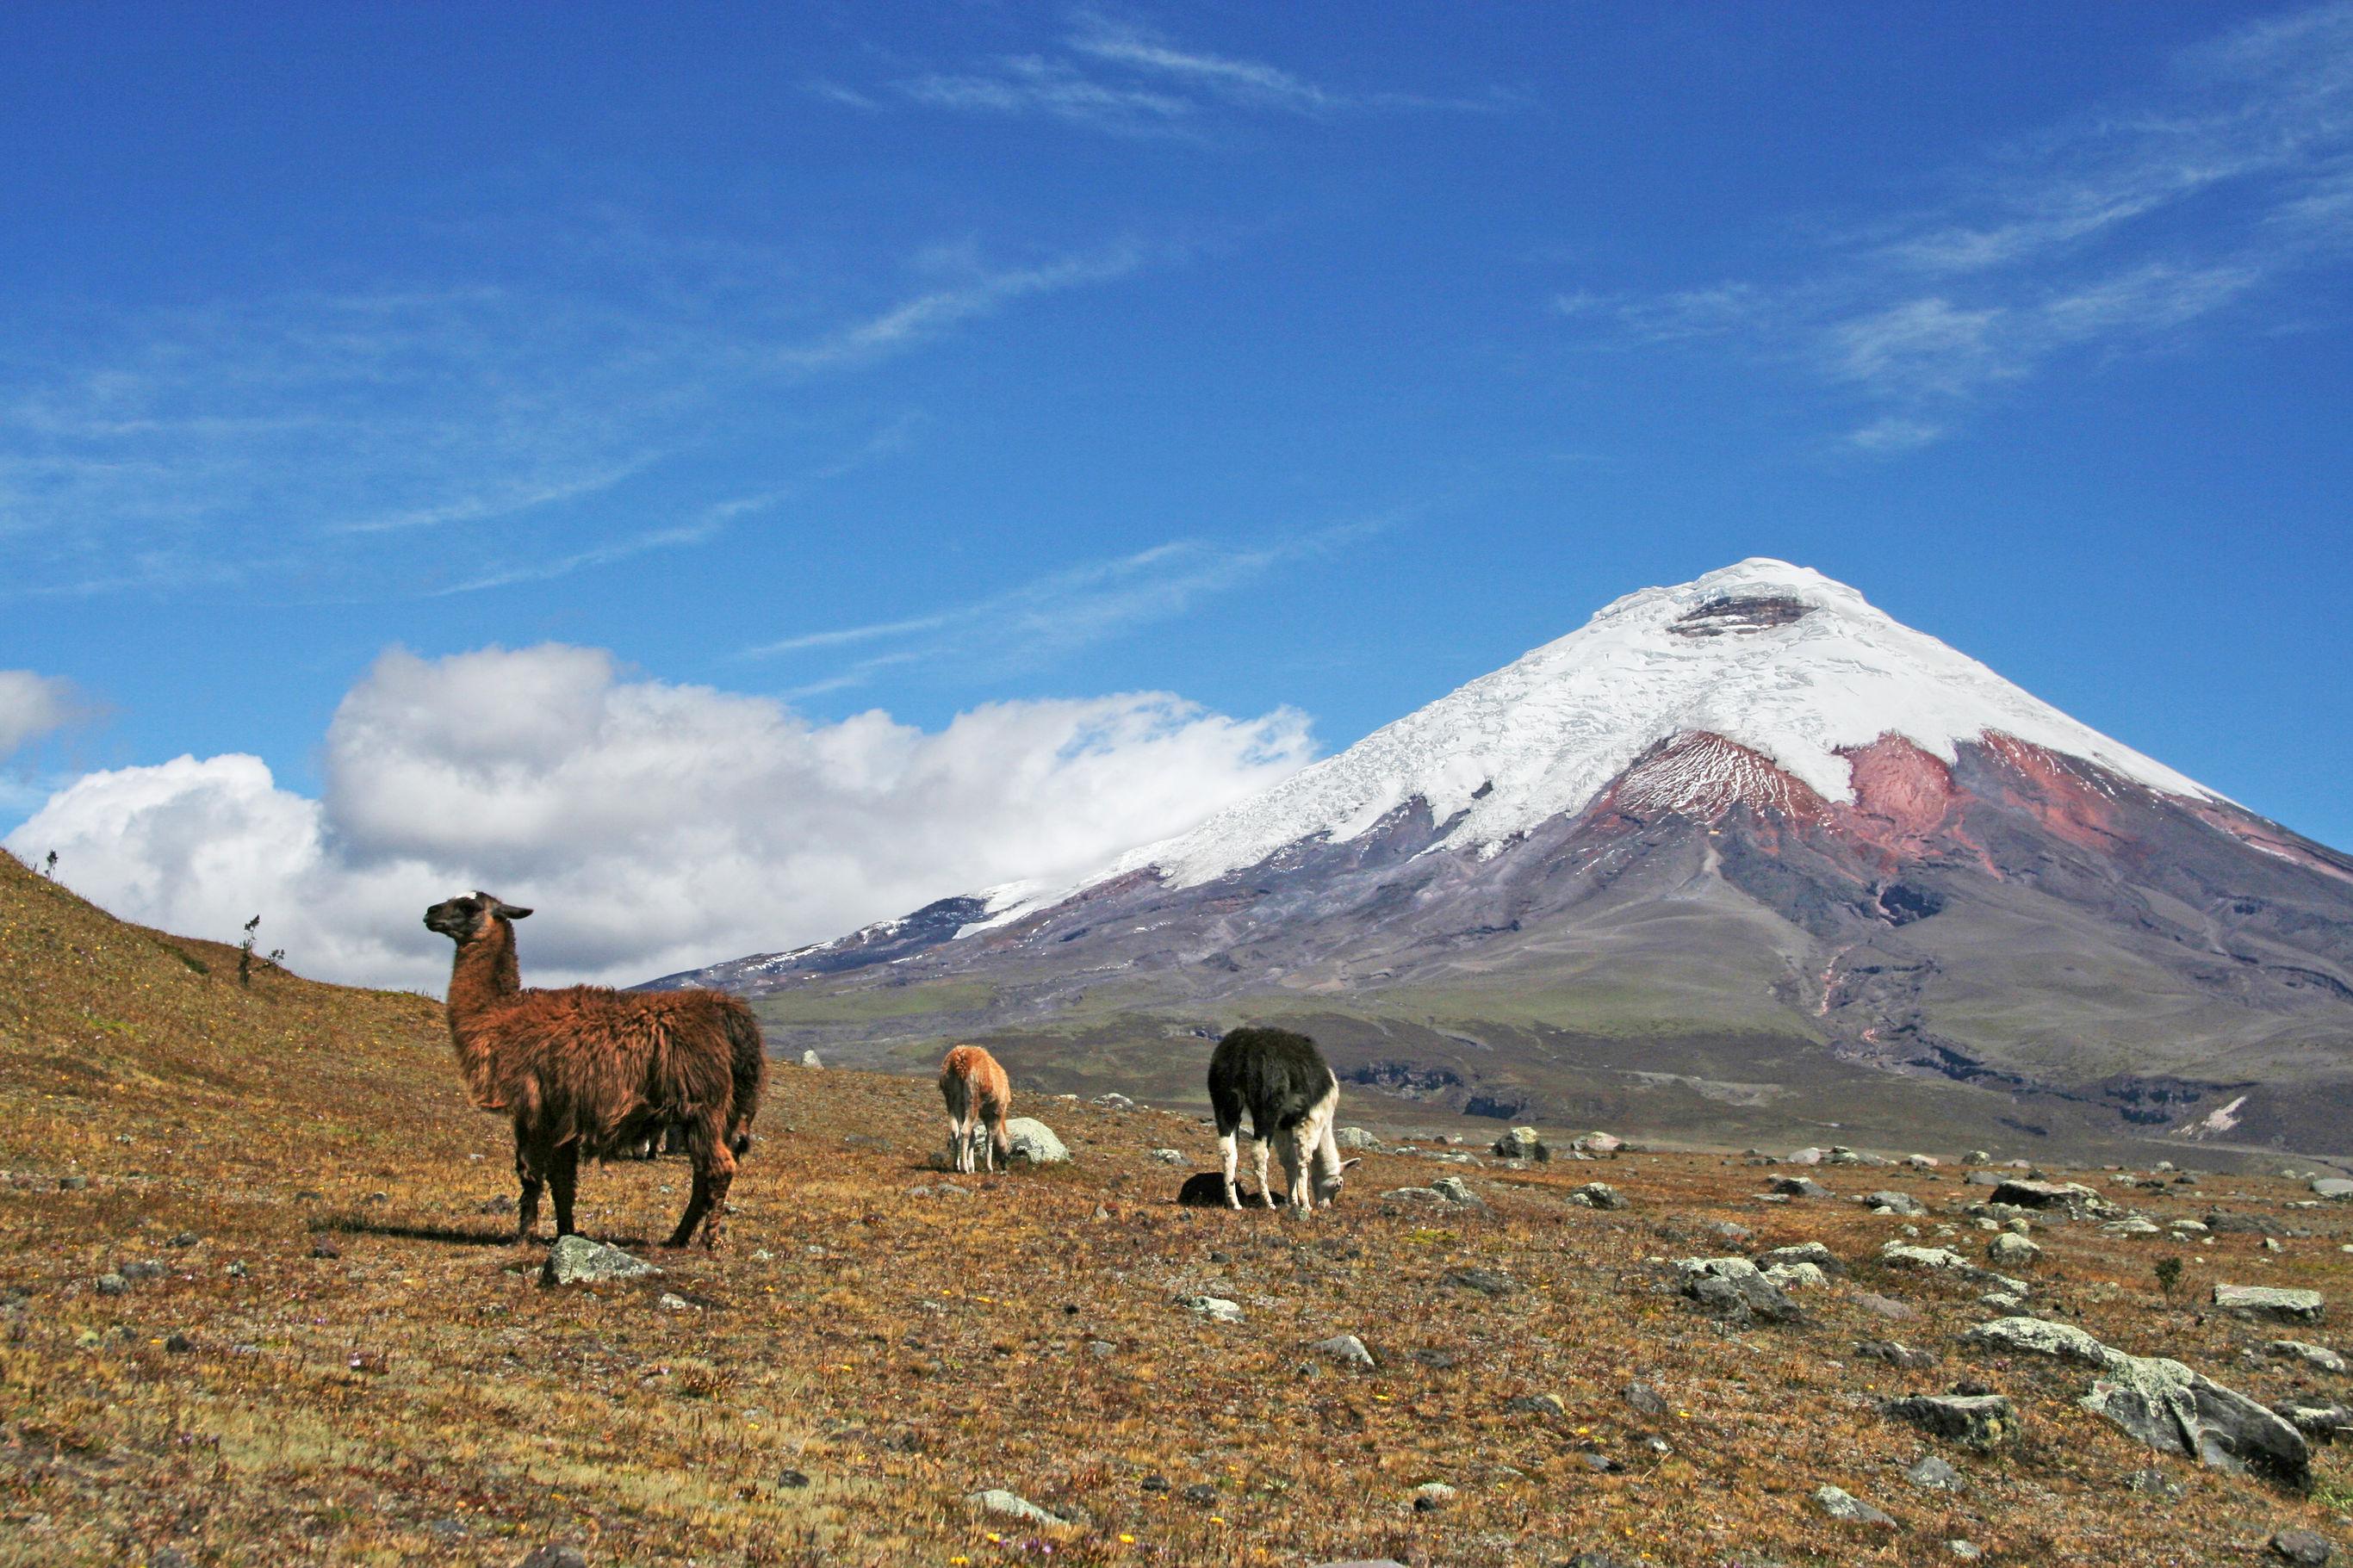 Sfeerimpressie Rondreis Ecuador: Avenue der vulkanen